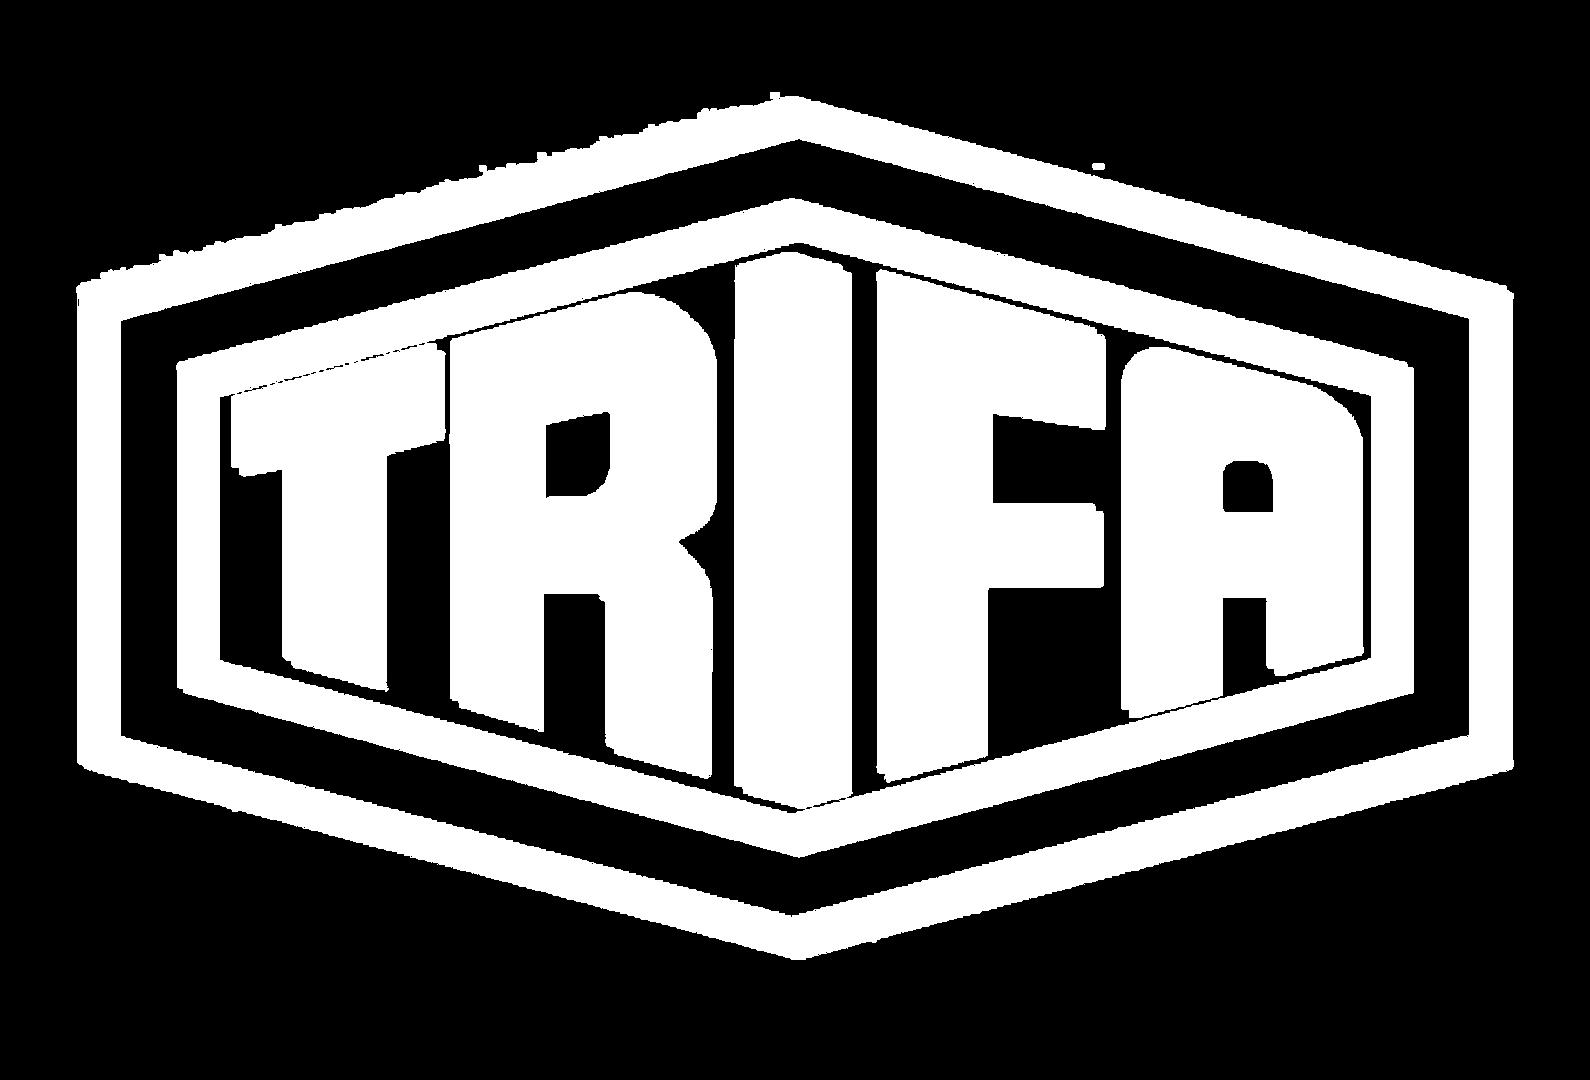 LOGO-TRIFA.png